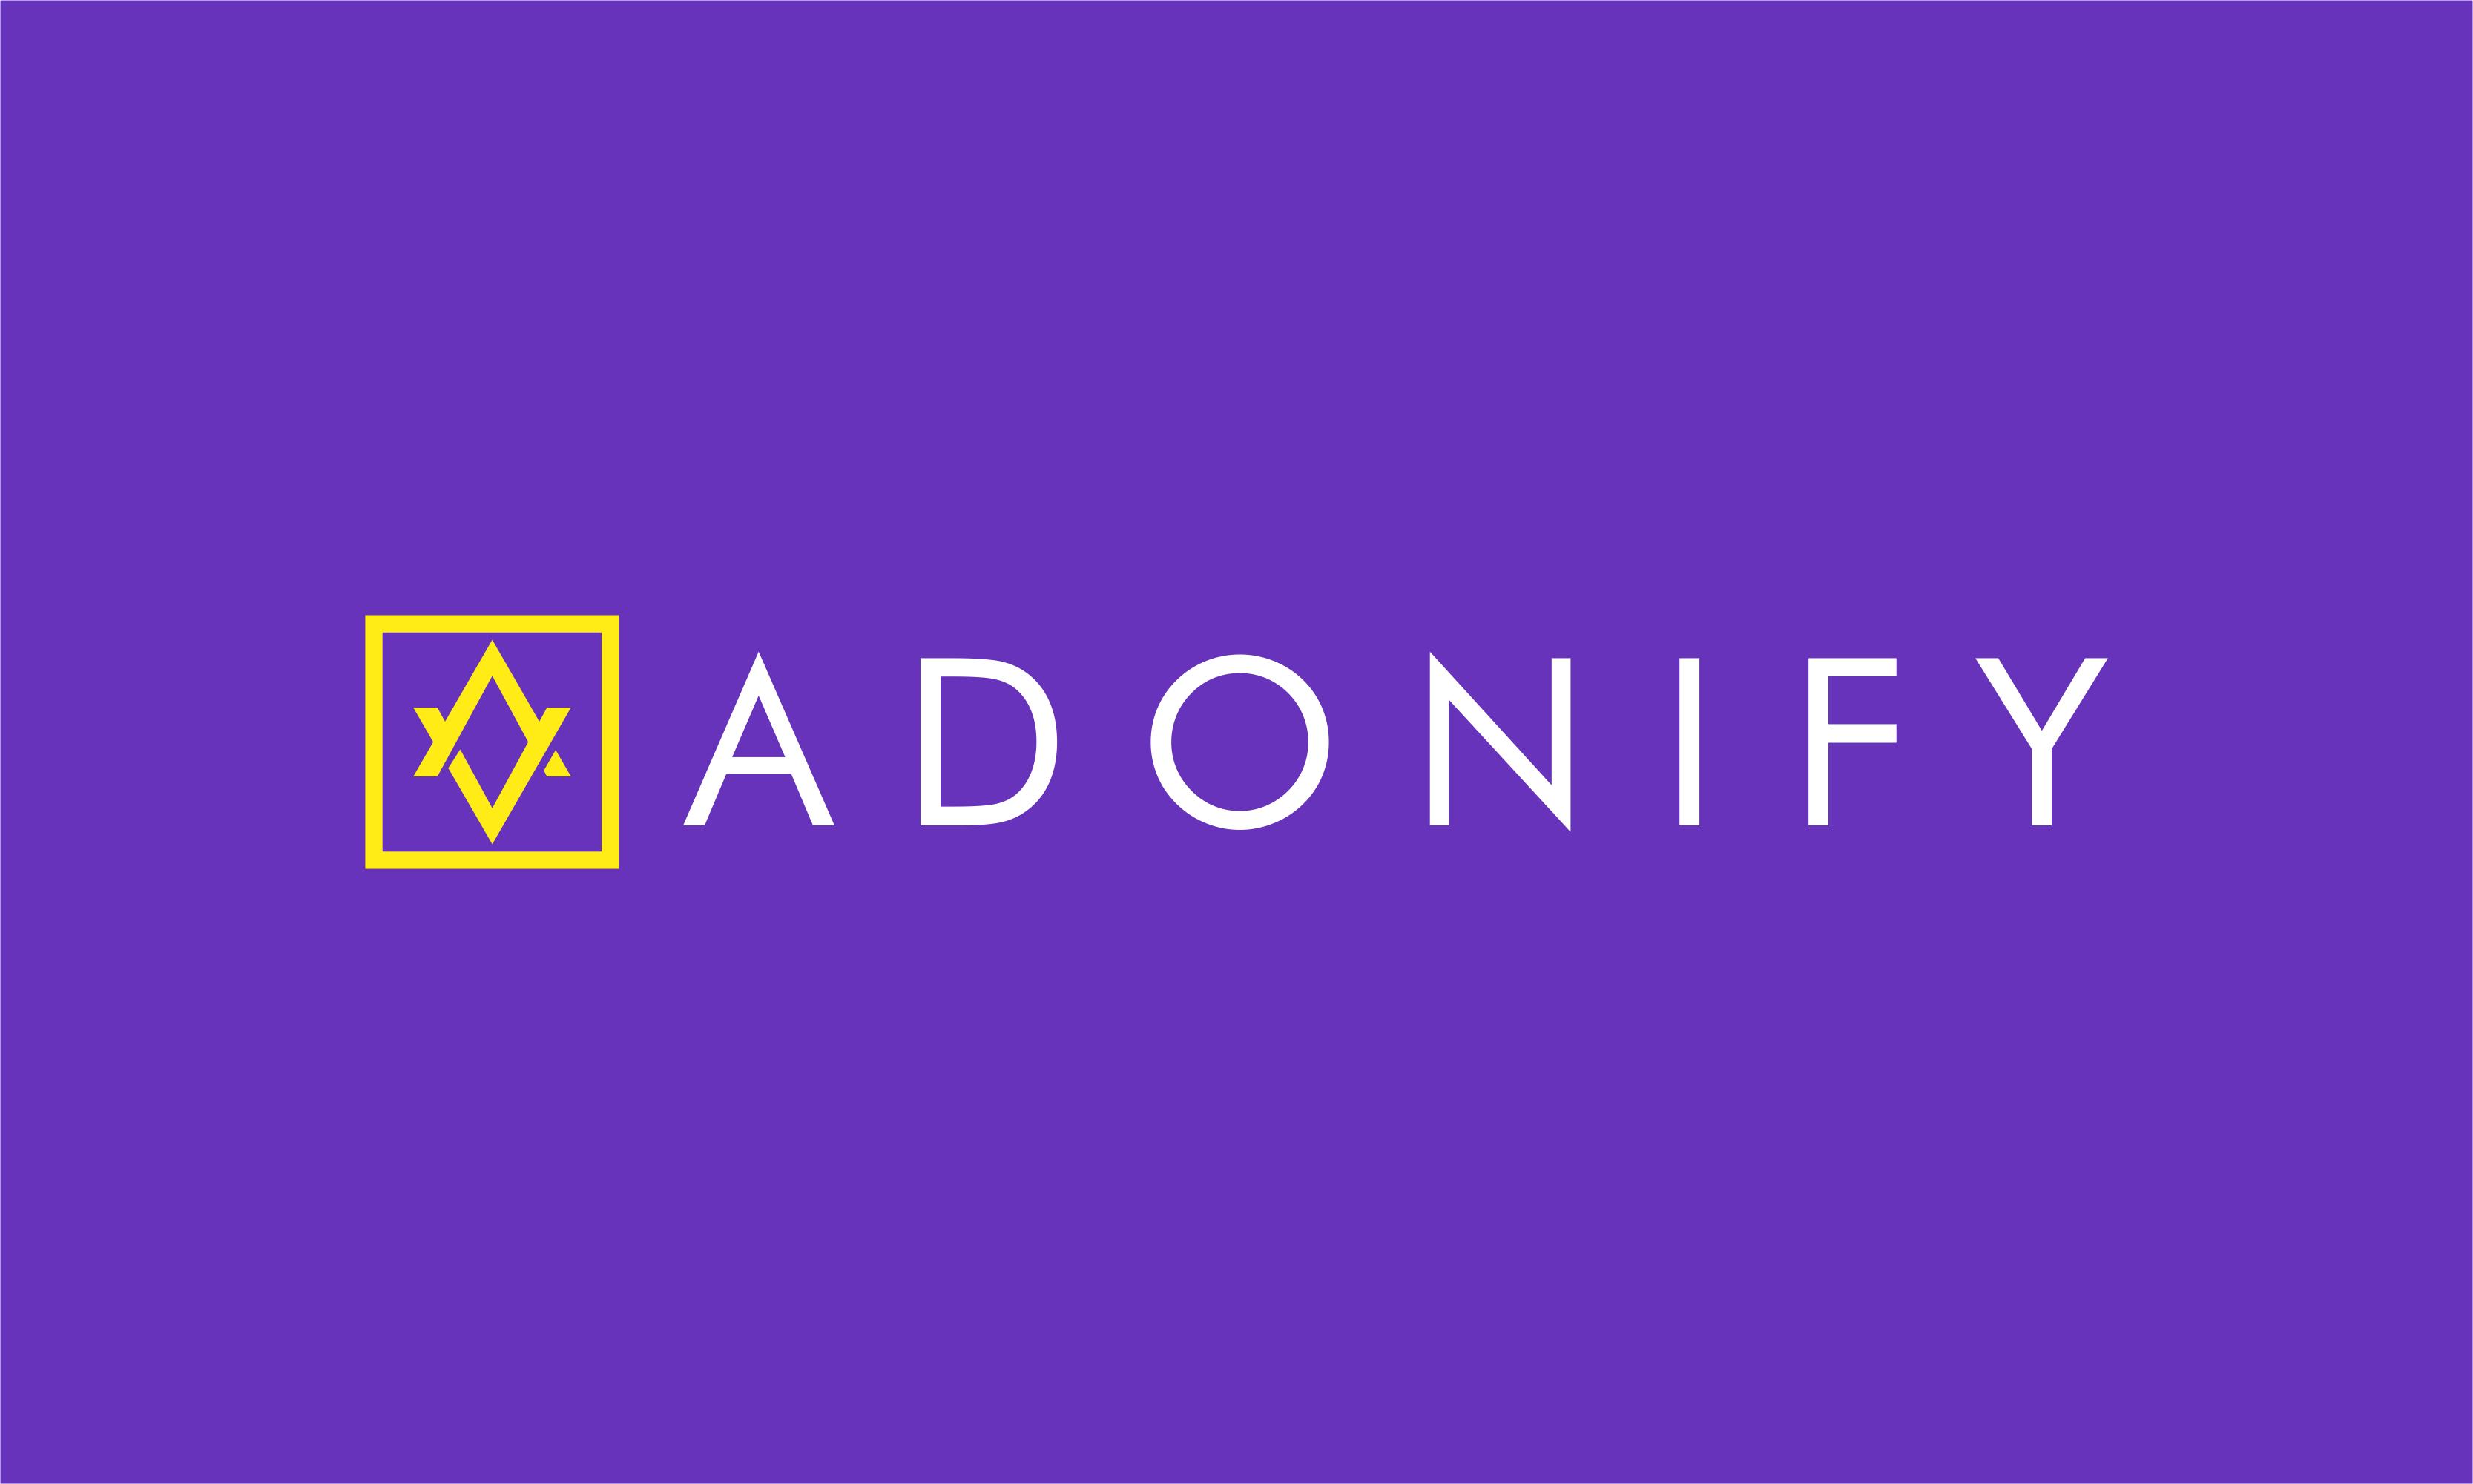 Adonify